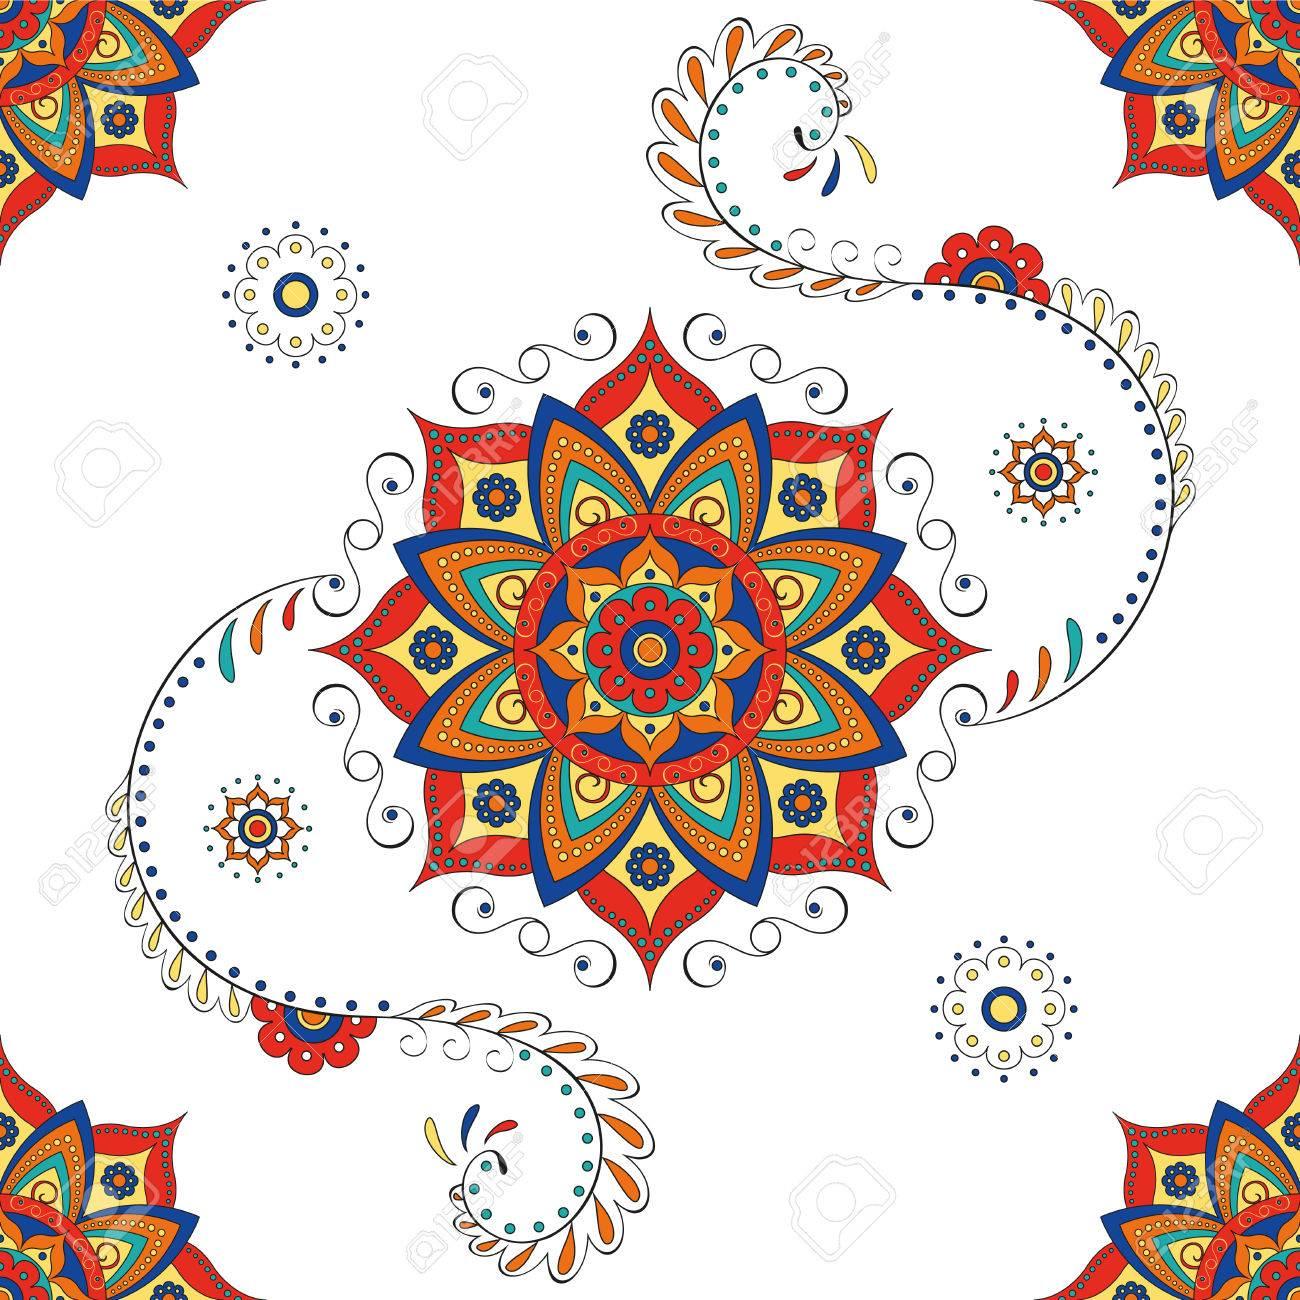 Hindu mandala lotus flower pattern royalty free cliparts vectors hindu mandala lotus flower pattern stock vector 40918093 izmirmasajfo